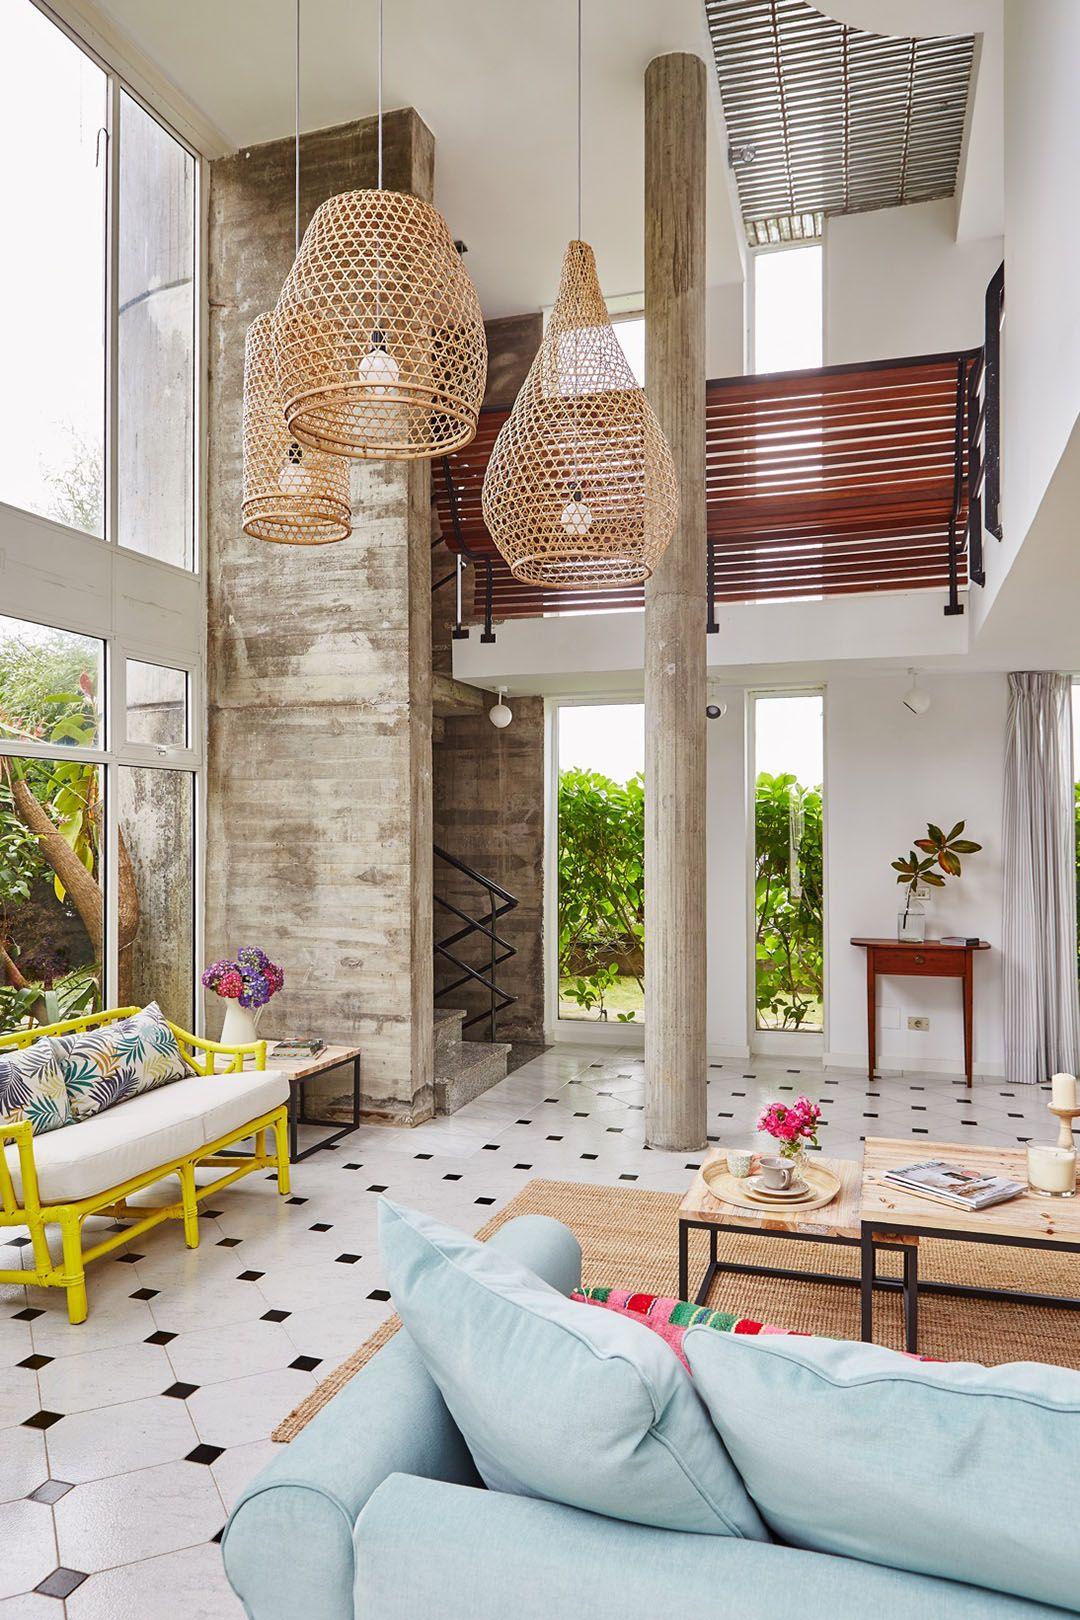 Abracadabra Decor Vigo Home Staging decora para vender o alquilar casa de vacaciones - salón